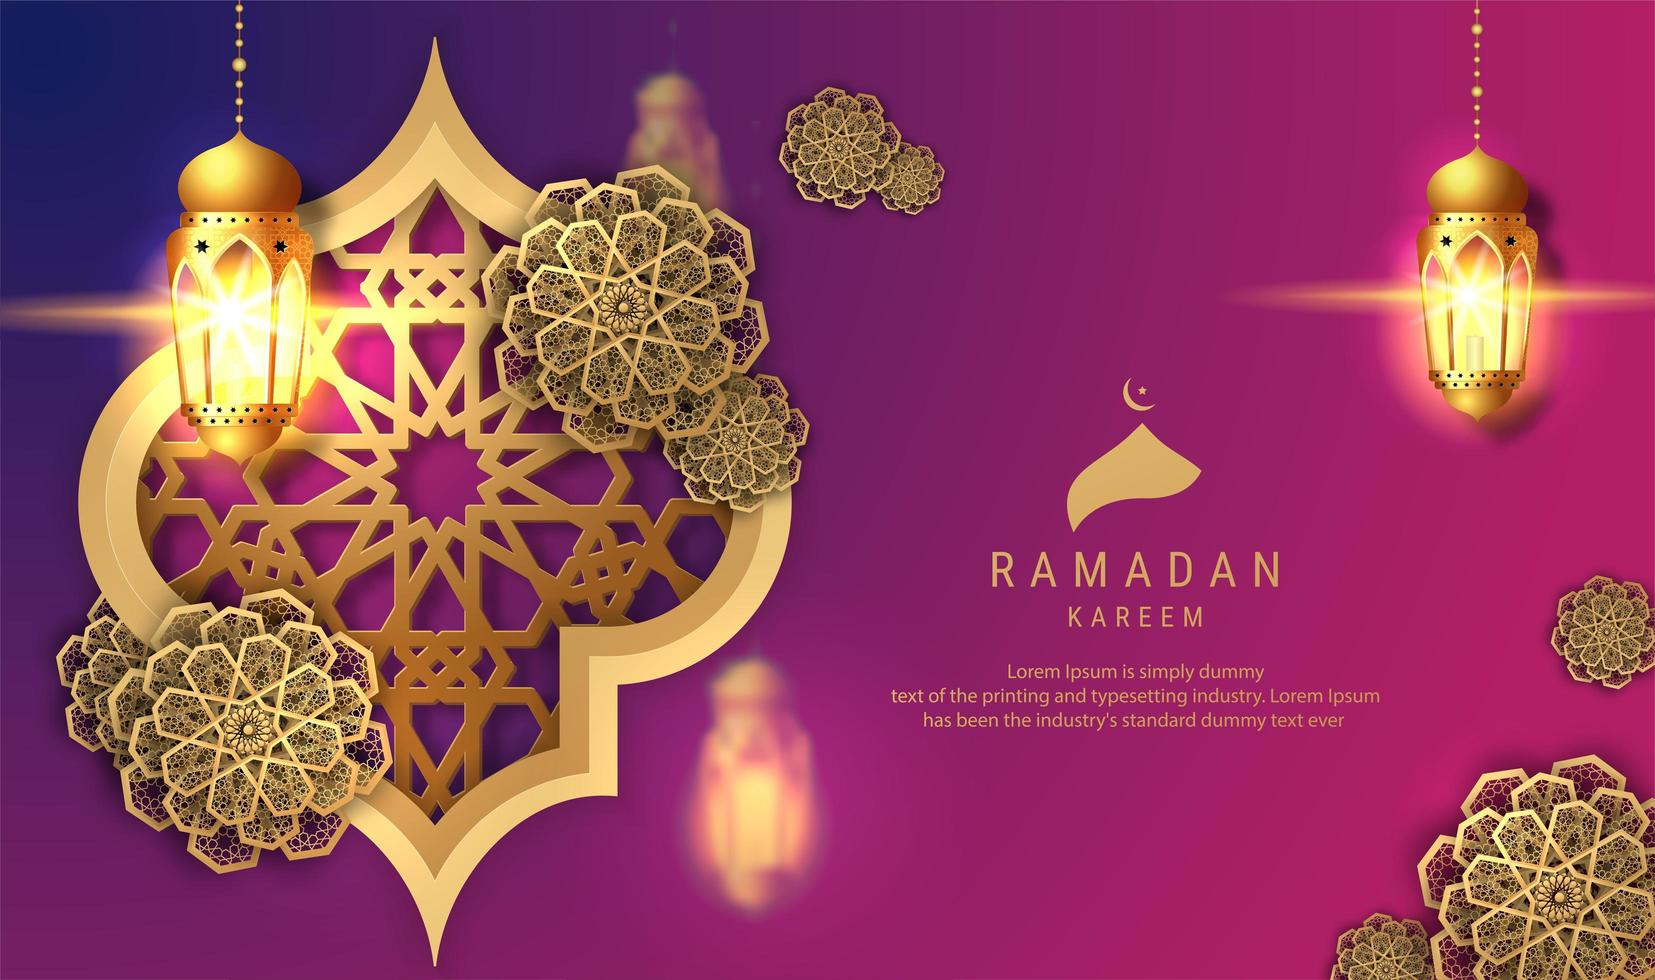 ramadan kareem paarse achtergrond met hangende lantaarns vector